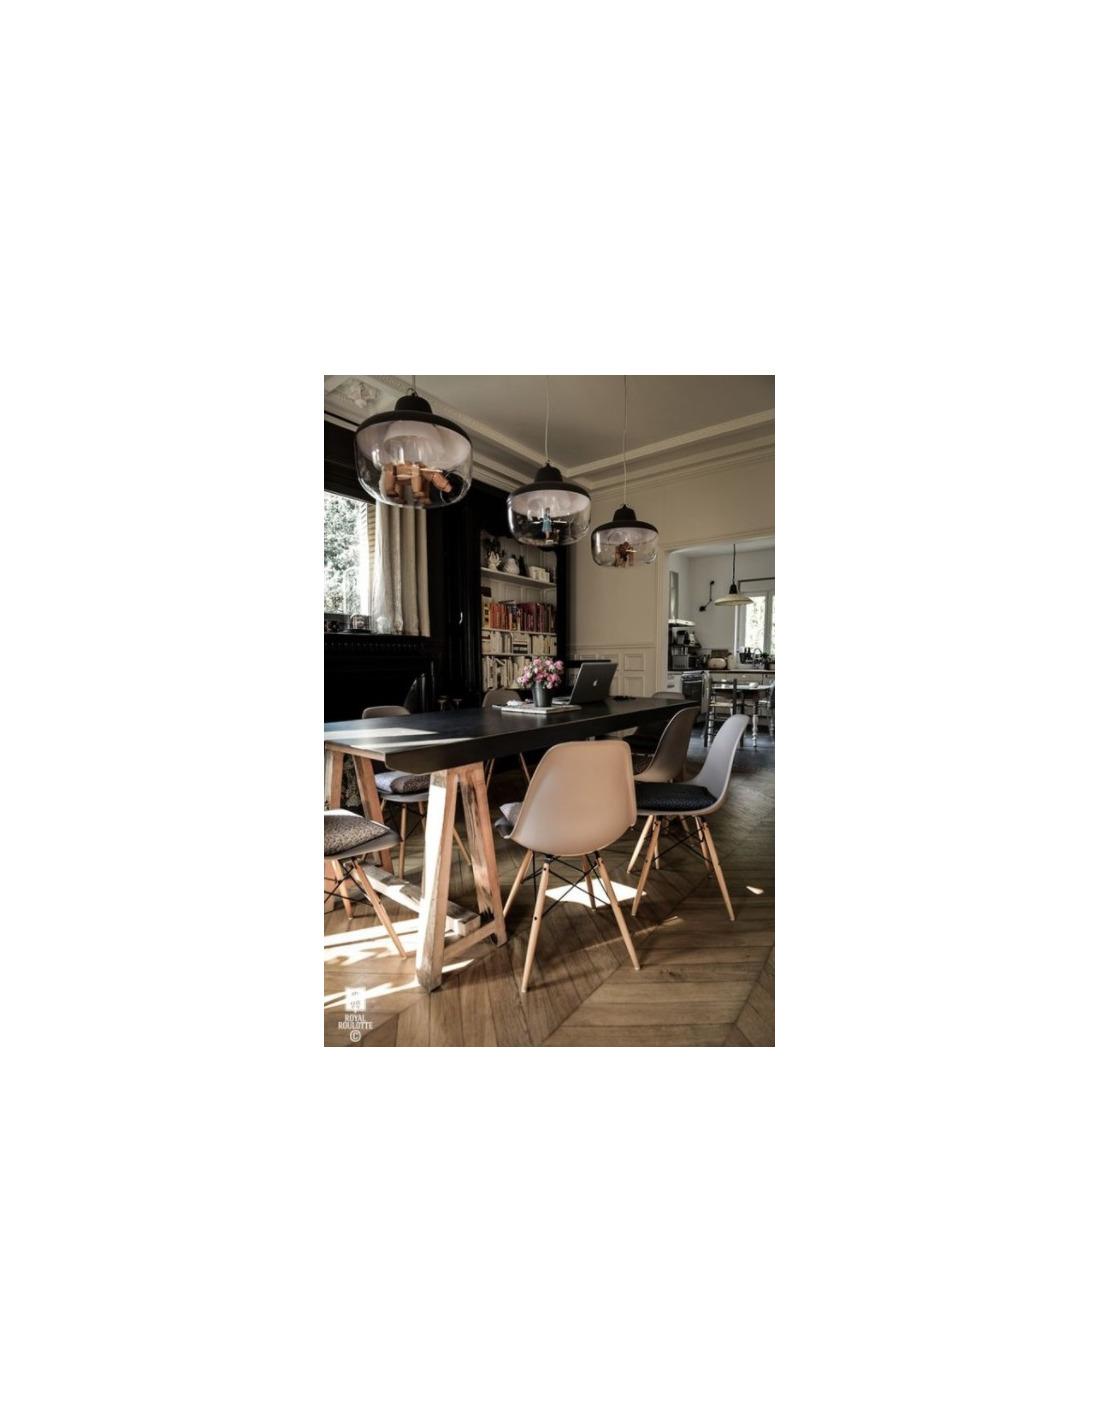 suspension favorite things noir par chen karlsson otoko. Black Bedroom Furniture Sets. Home Design Ideas